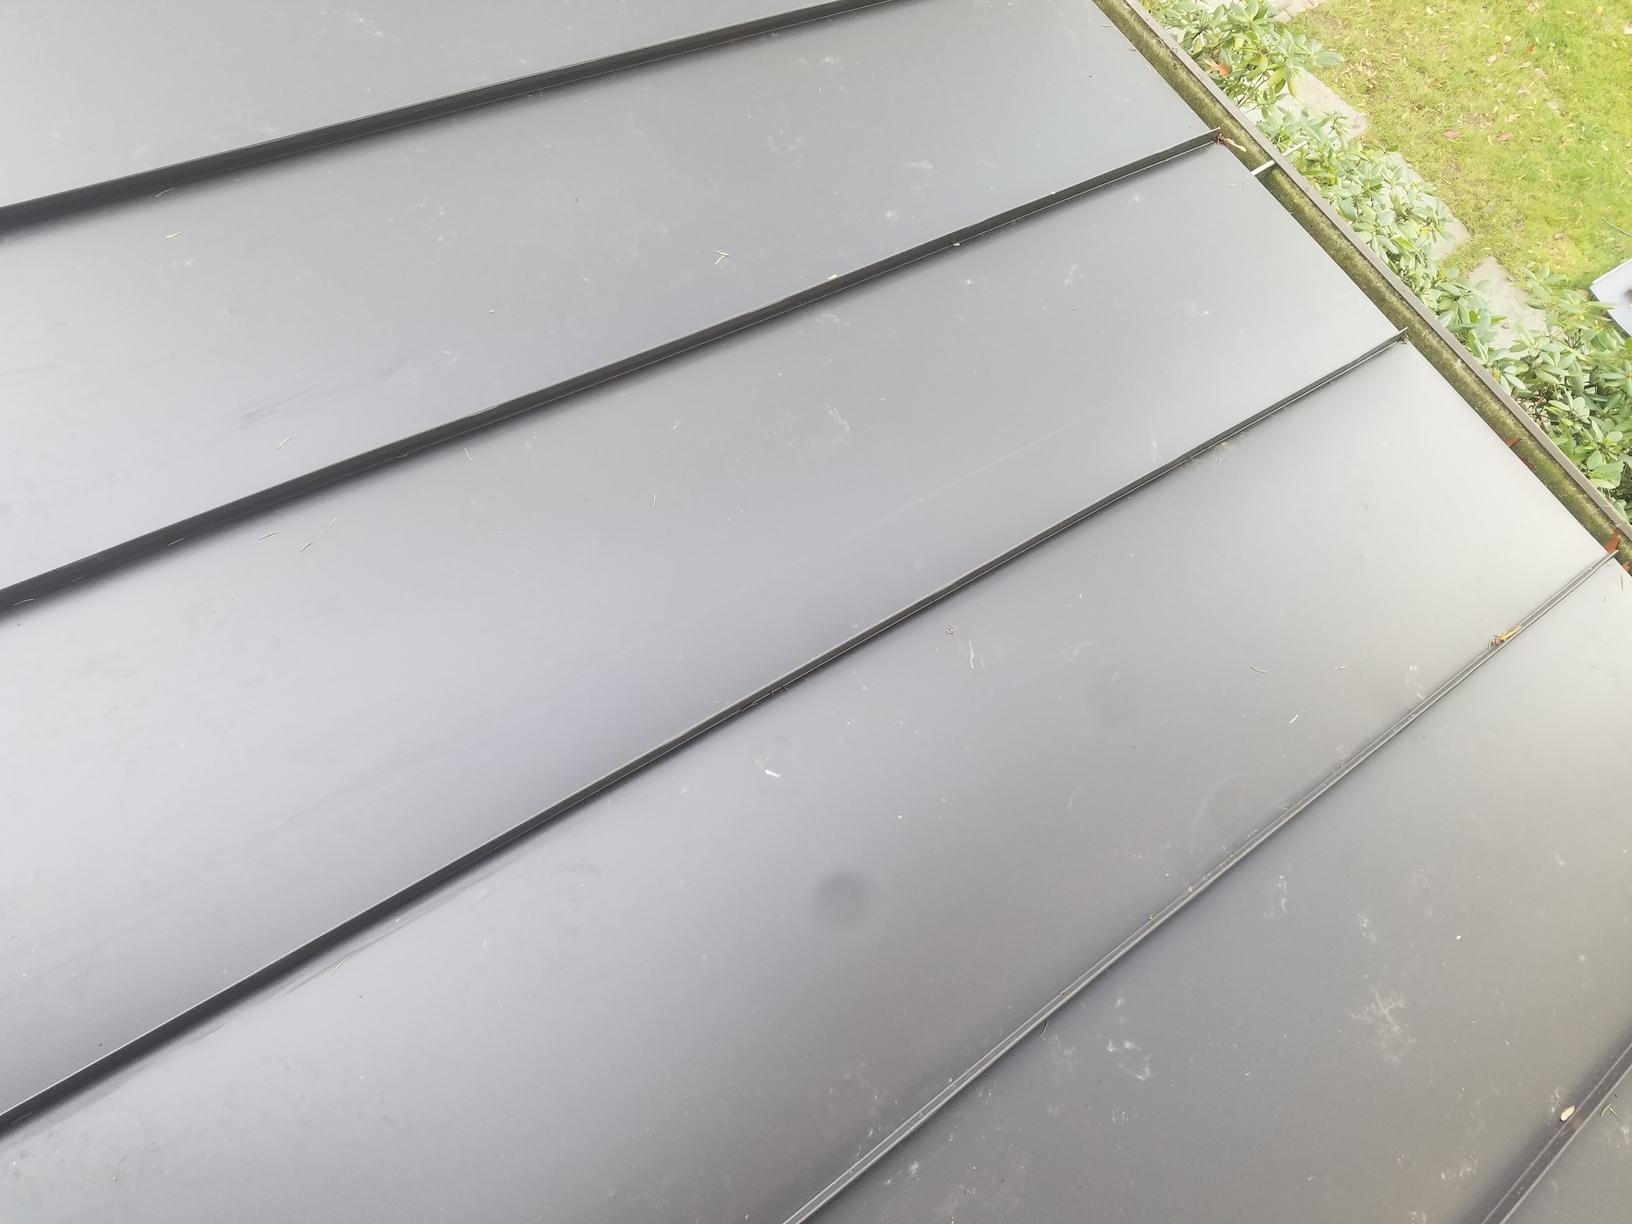 Experienced Standing Seam Metal Roof Installer in NJ